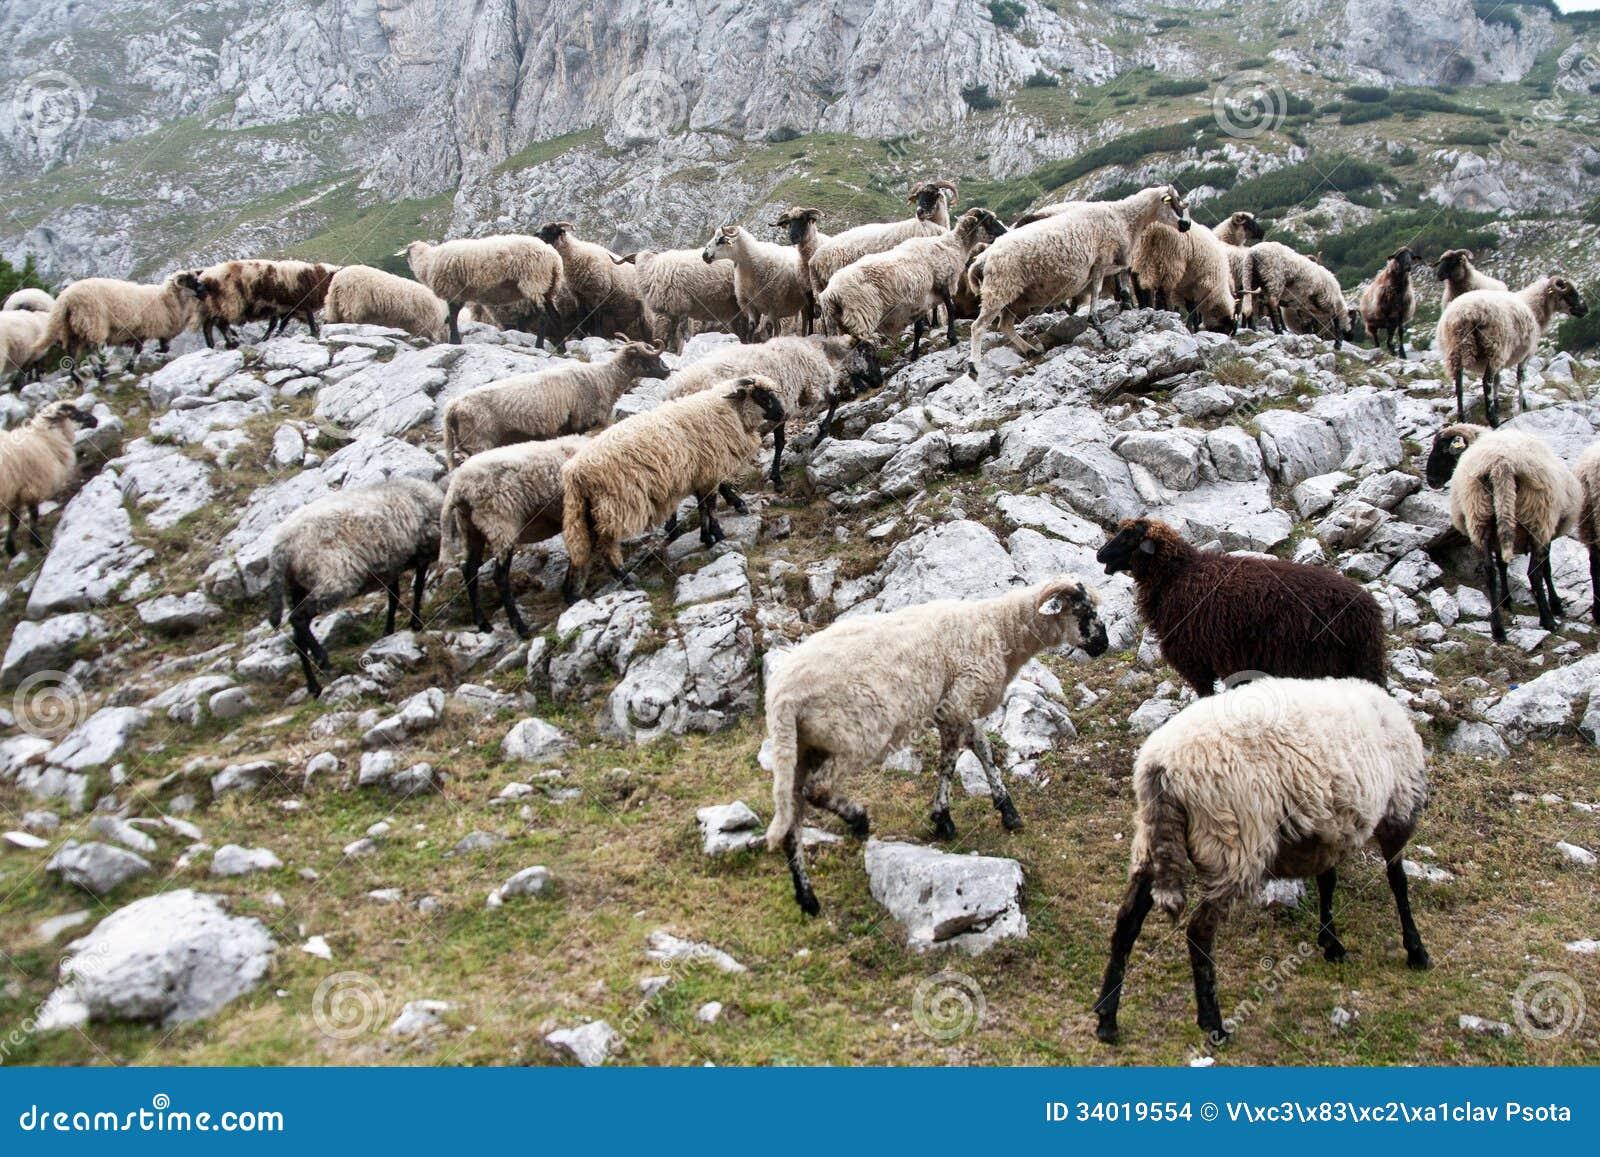 Sheep drove